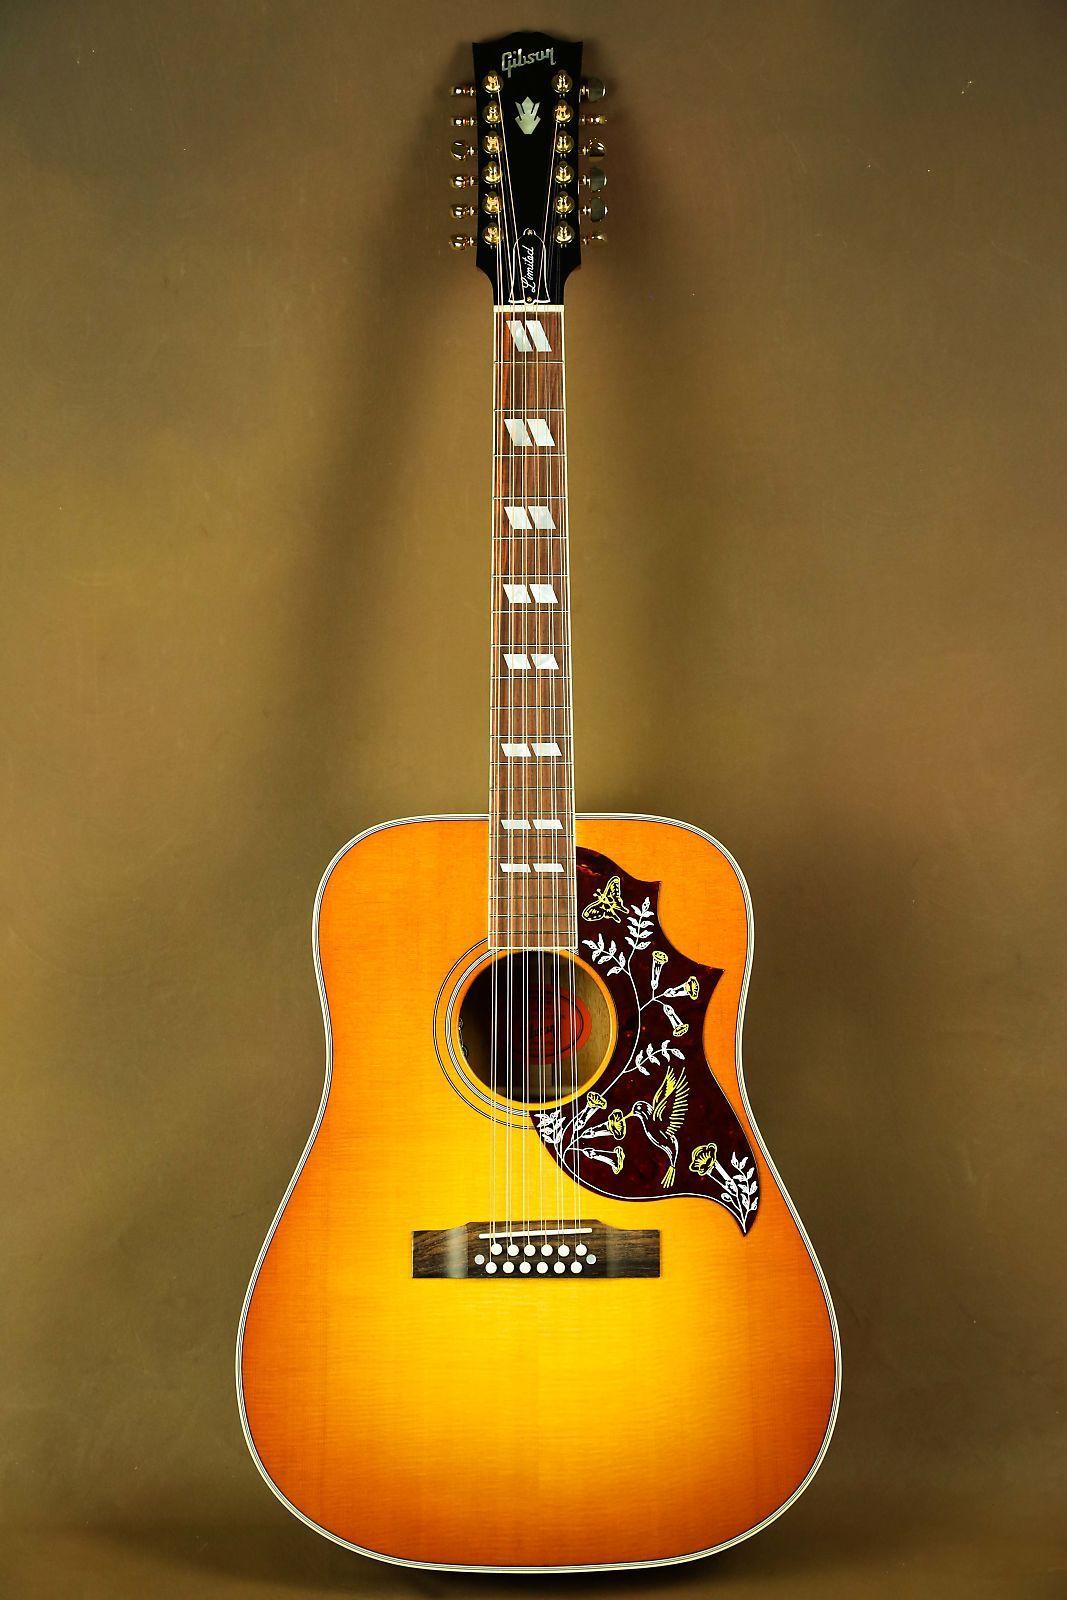 a905ccdaa09 Gibson Hummingbird 12-string Heritage Cherry Sunburst Acoustic Guitar